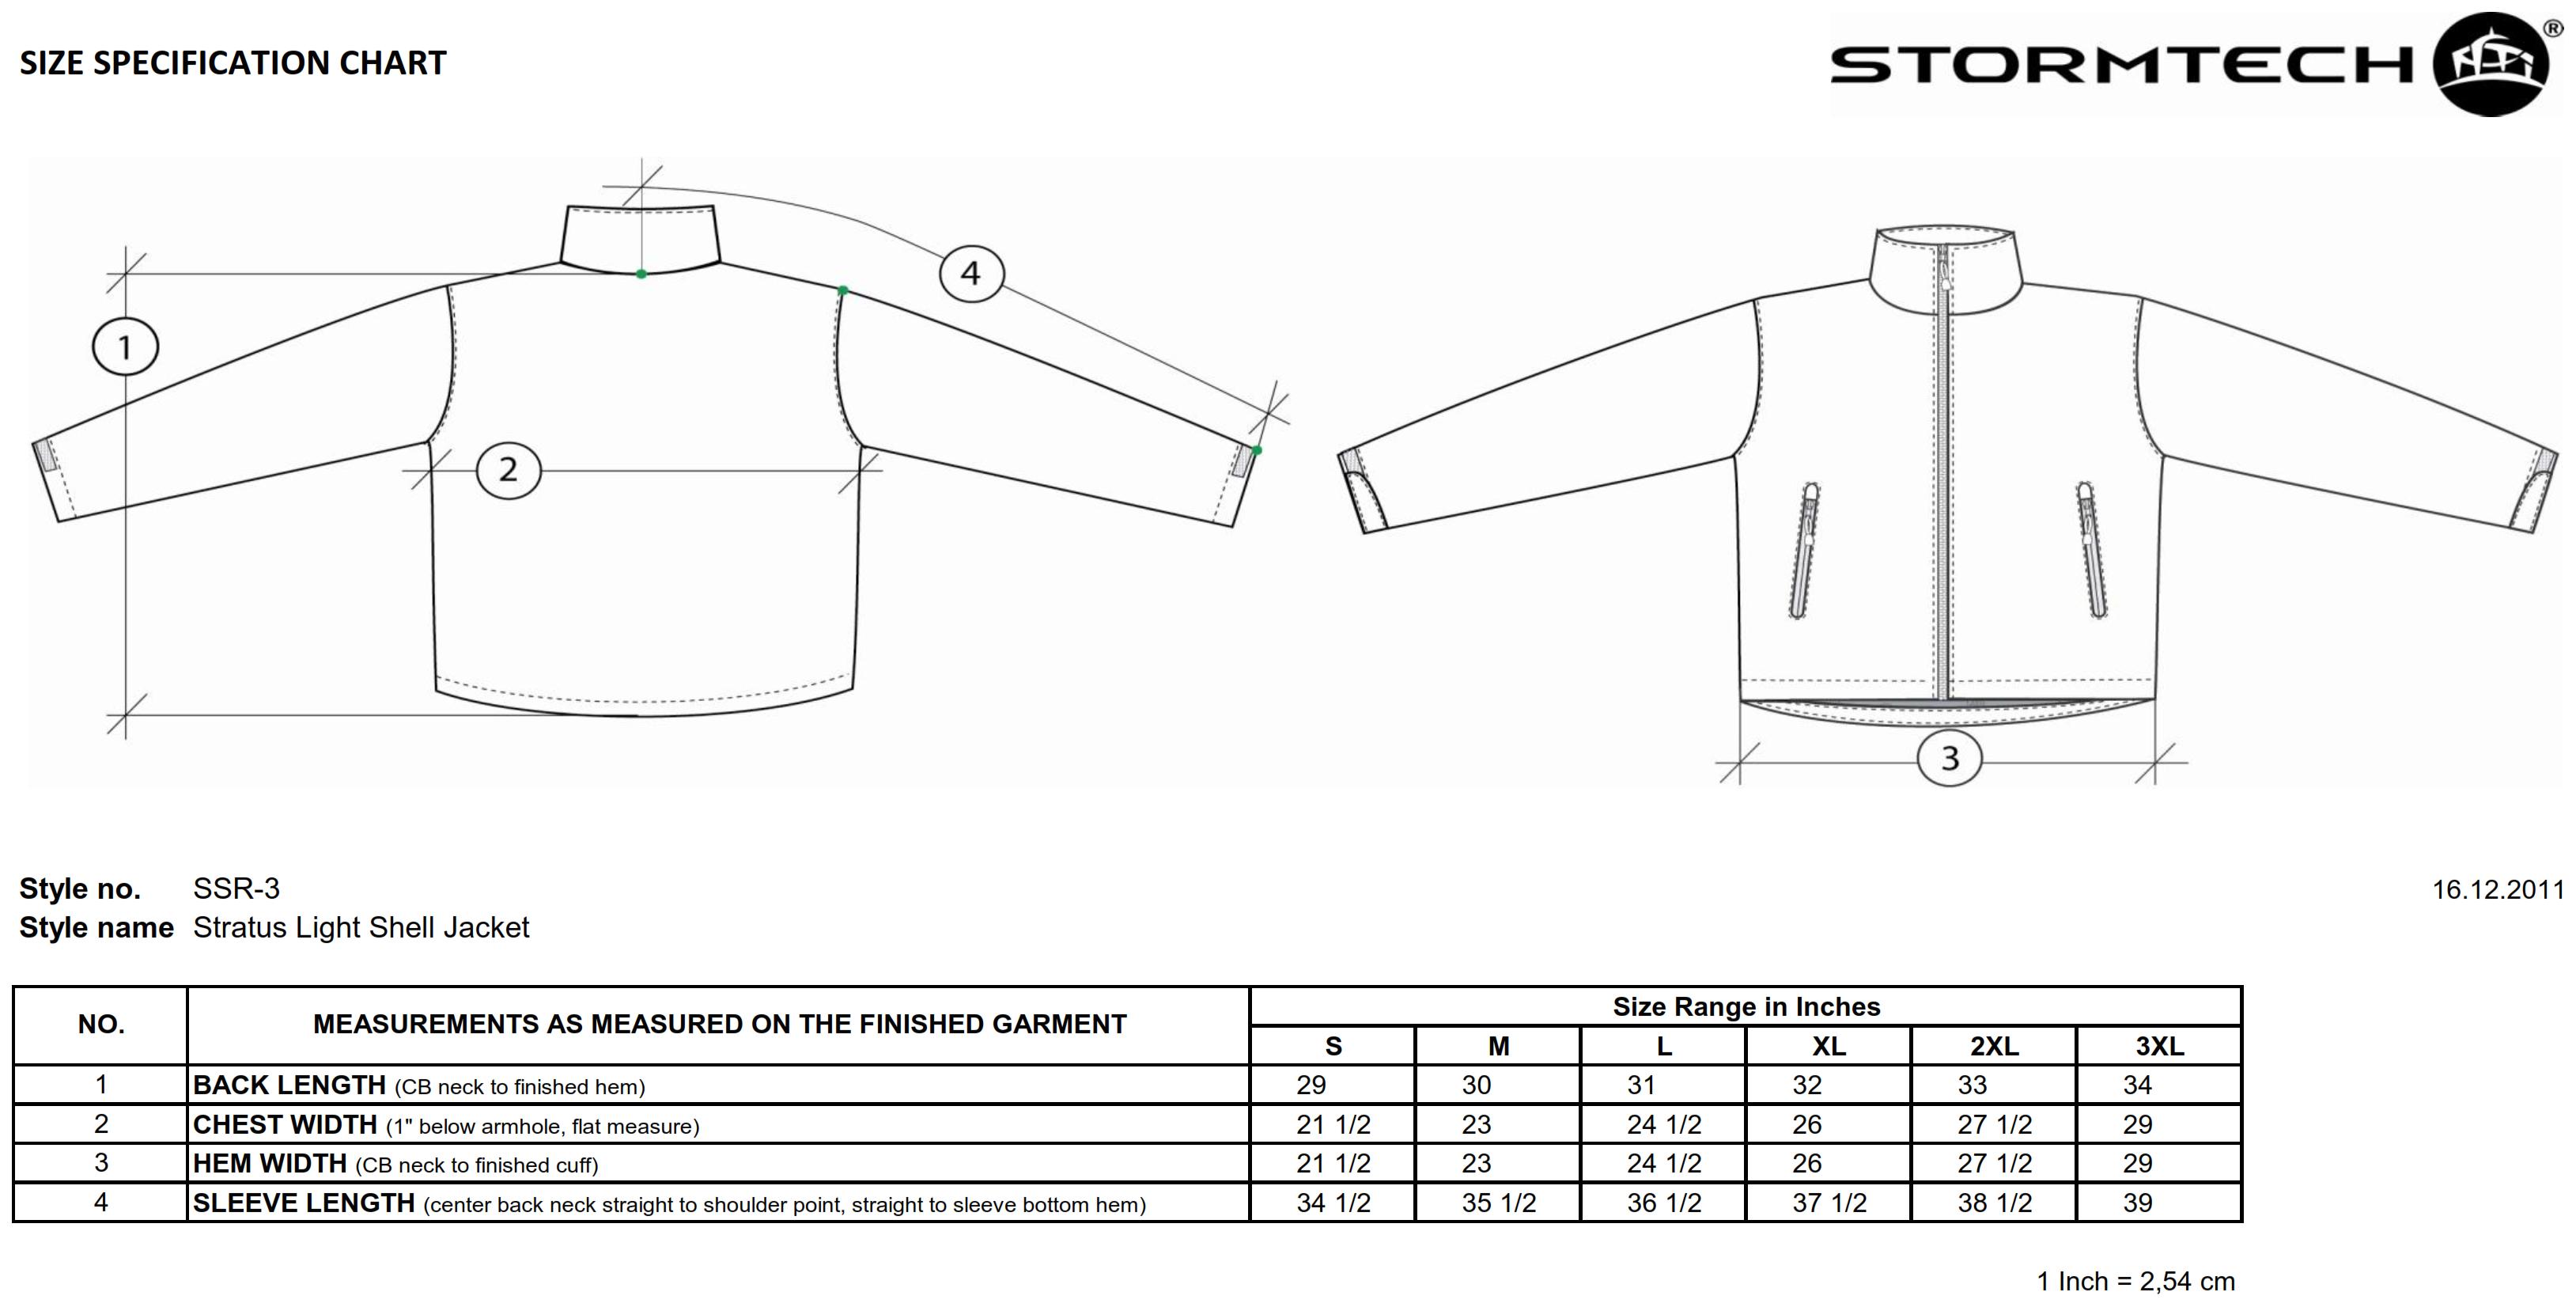 StormTech: Stratus Light Shell Jacket SSR-3